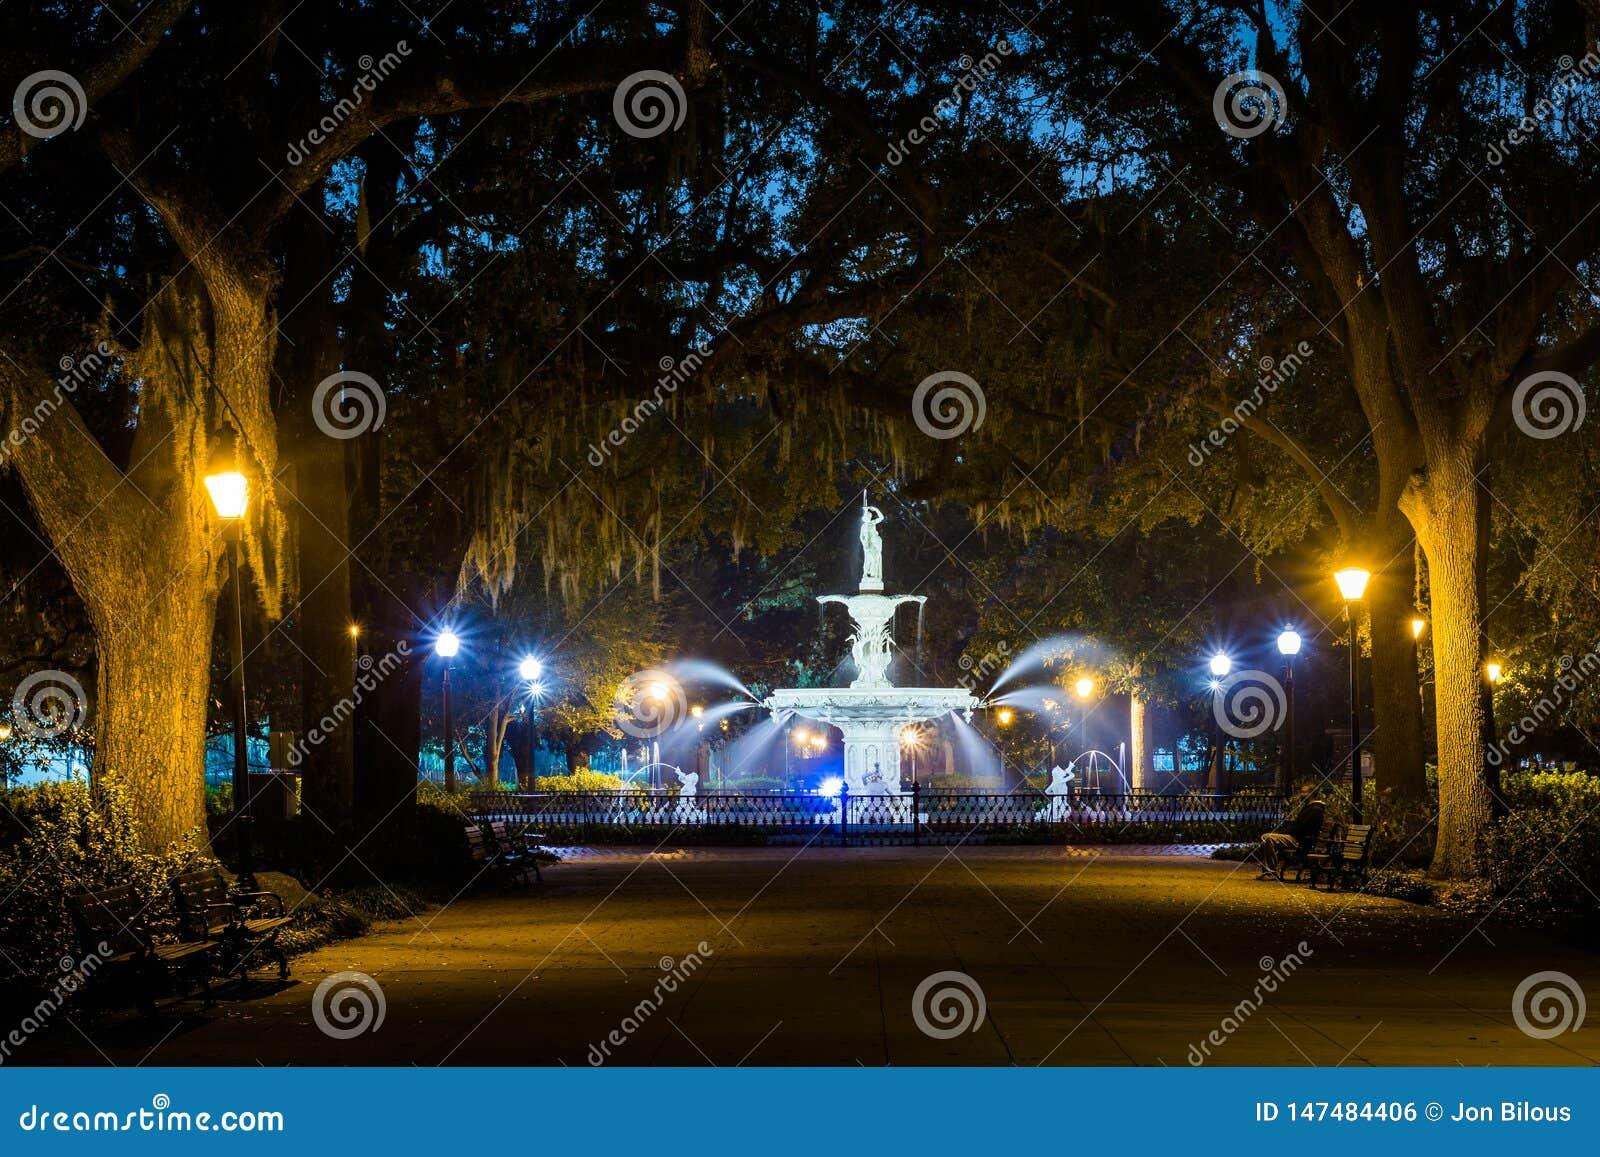 Walkway and fountain at night, at Forsyth Park, in Savannah, Georgia